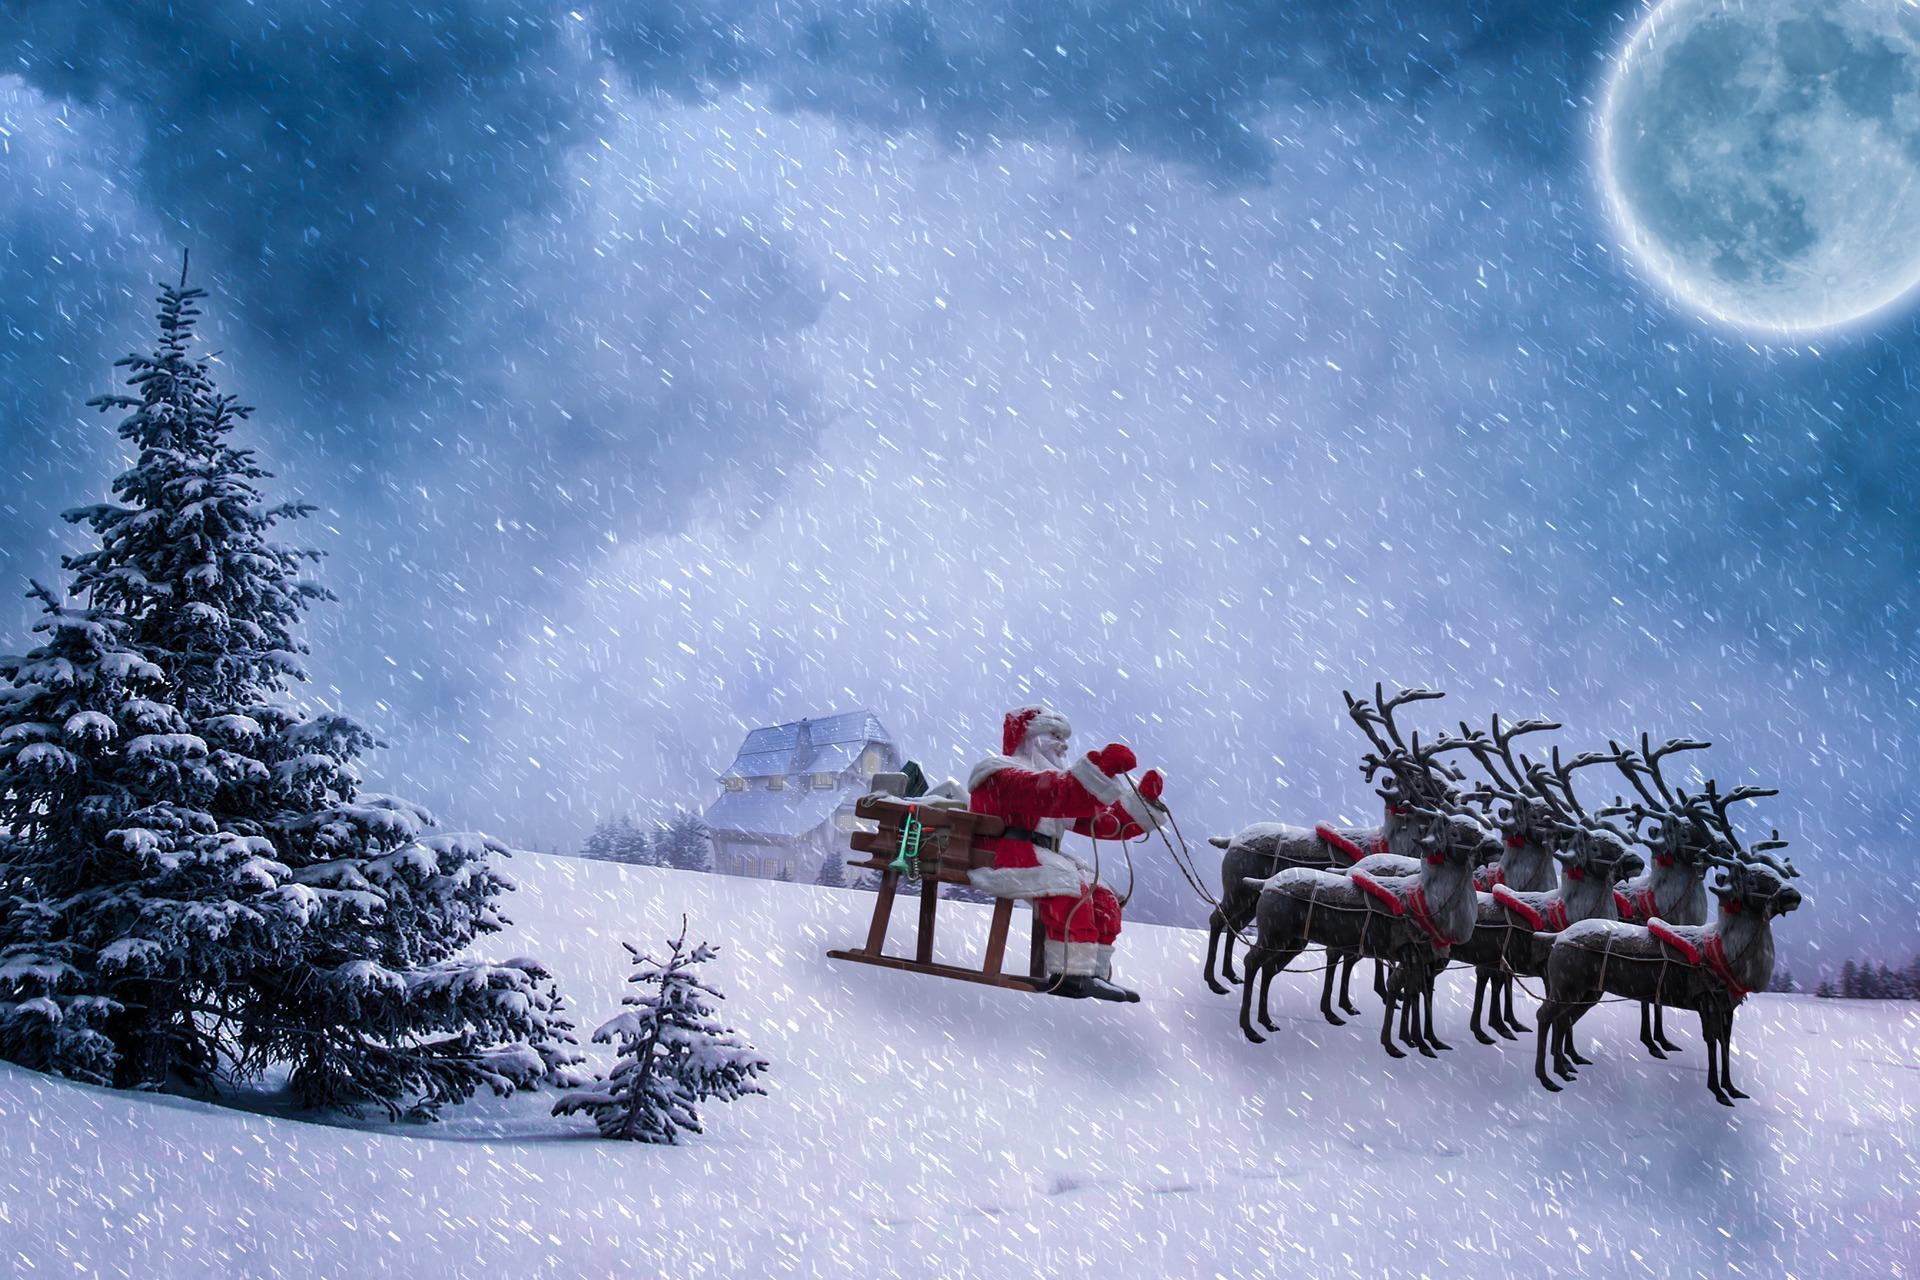 La Laponia Finlandesa: vive este año la magia del invierno